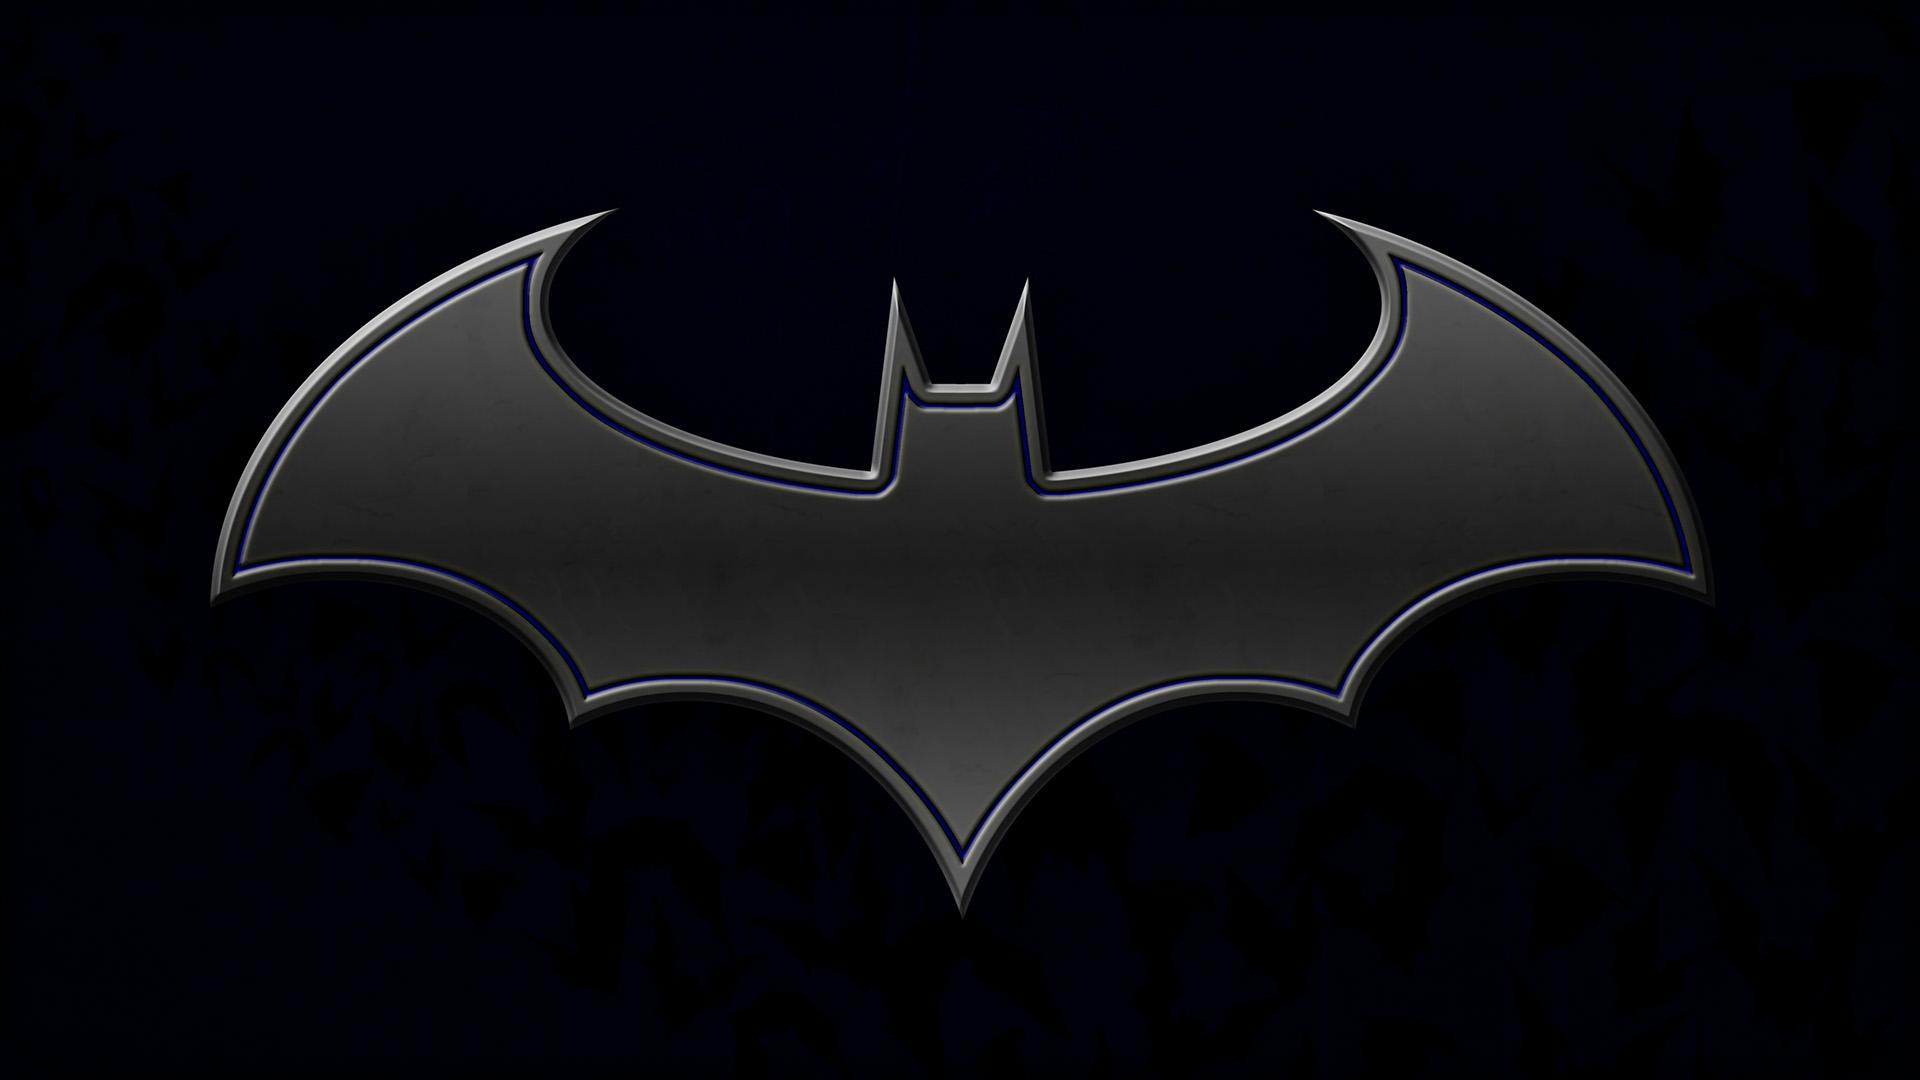 Batman Wallpaper Iphone Hd Batman wallpap 1920x1080